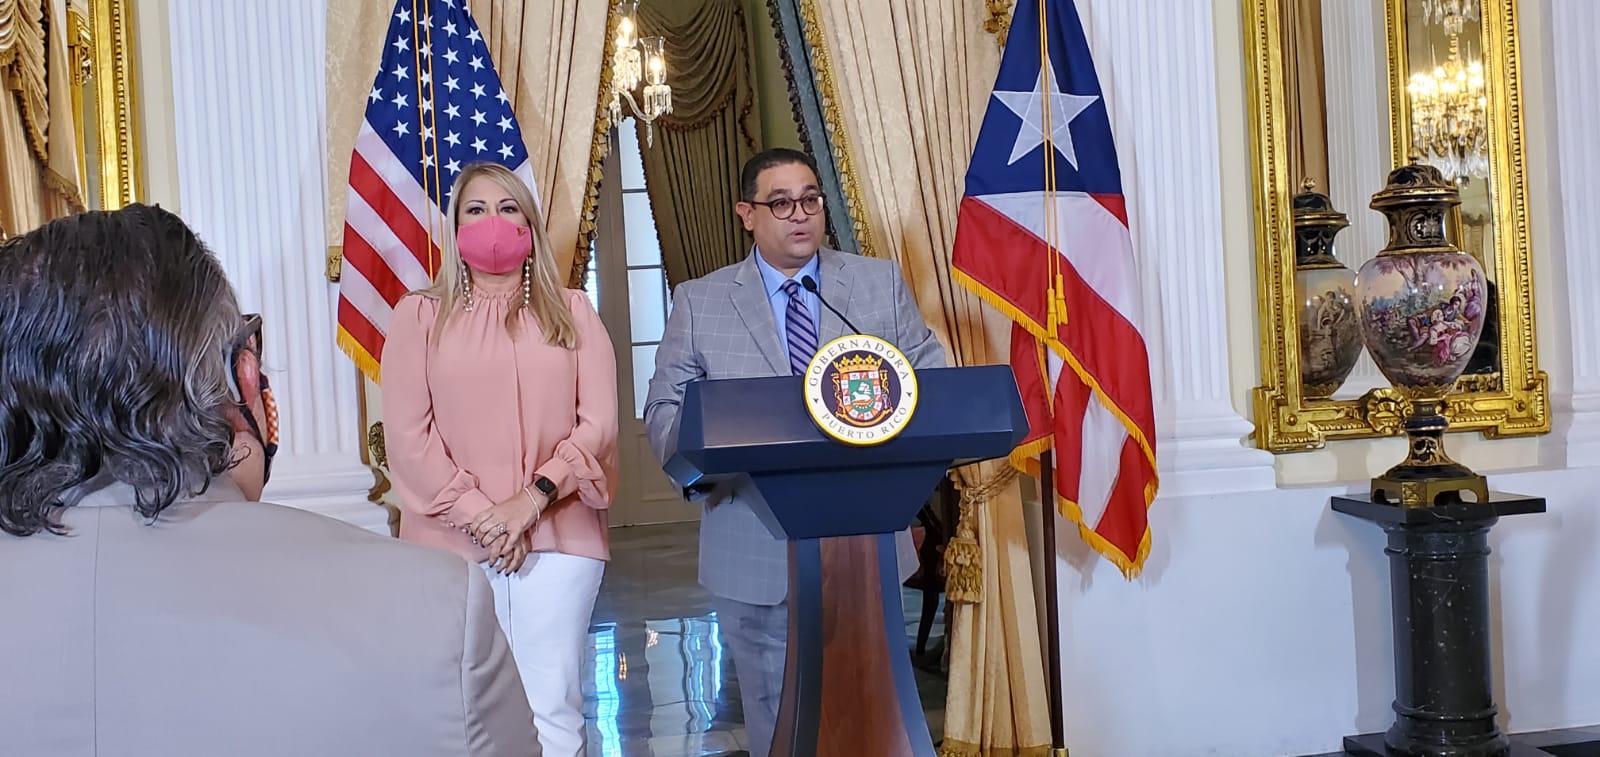 Gobernadora defiende nombramiento de Osvaldo Soto García como Contralor de Puerto Rico (Ampliación, Sonidos)